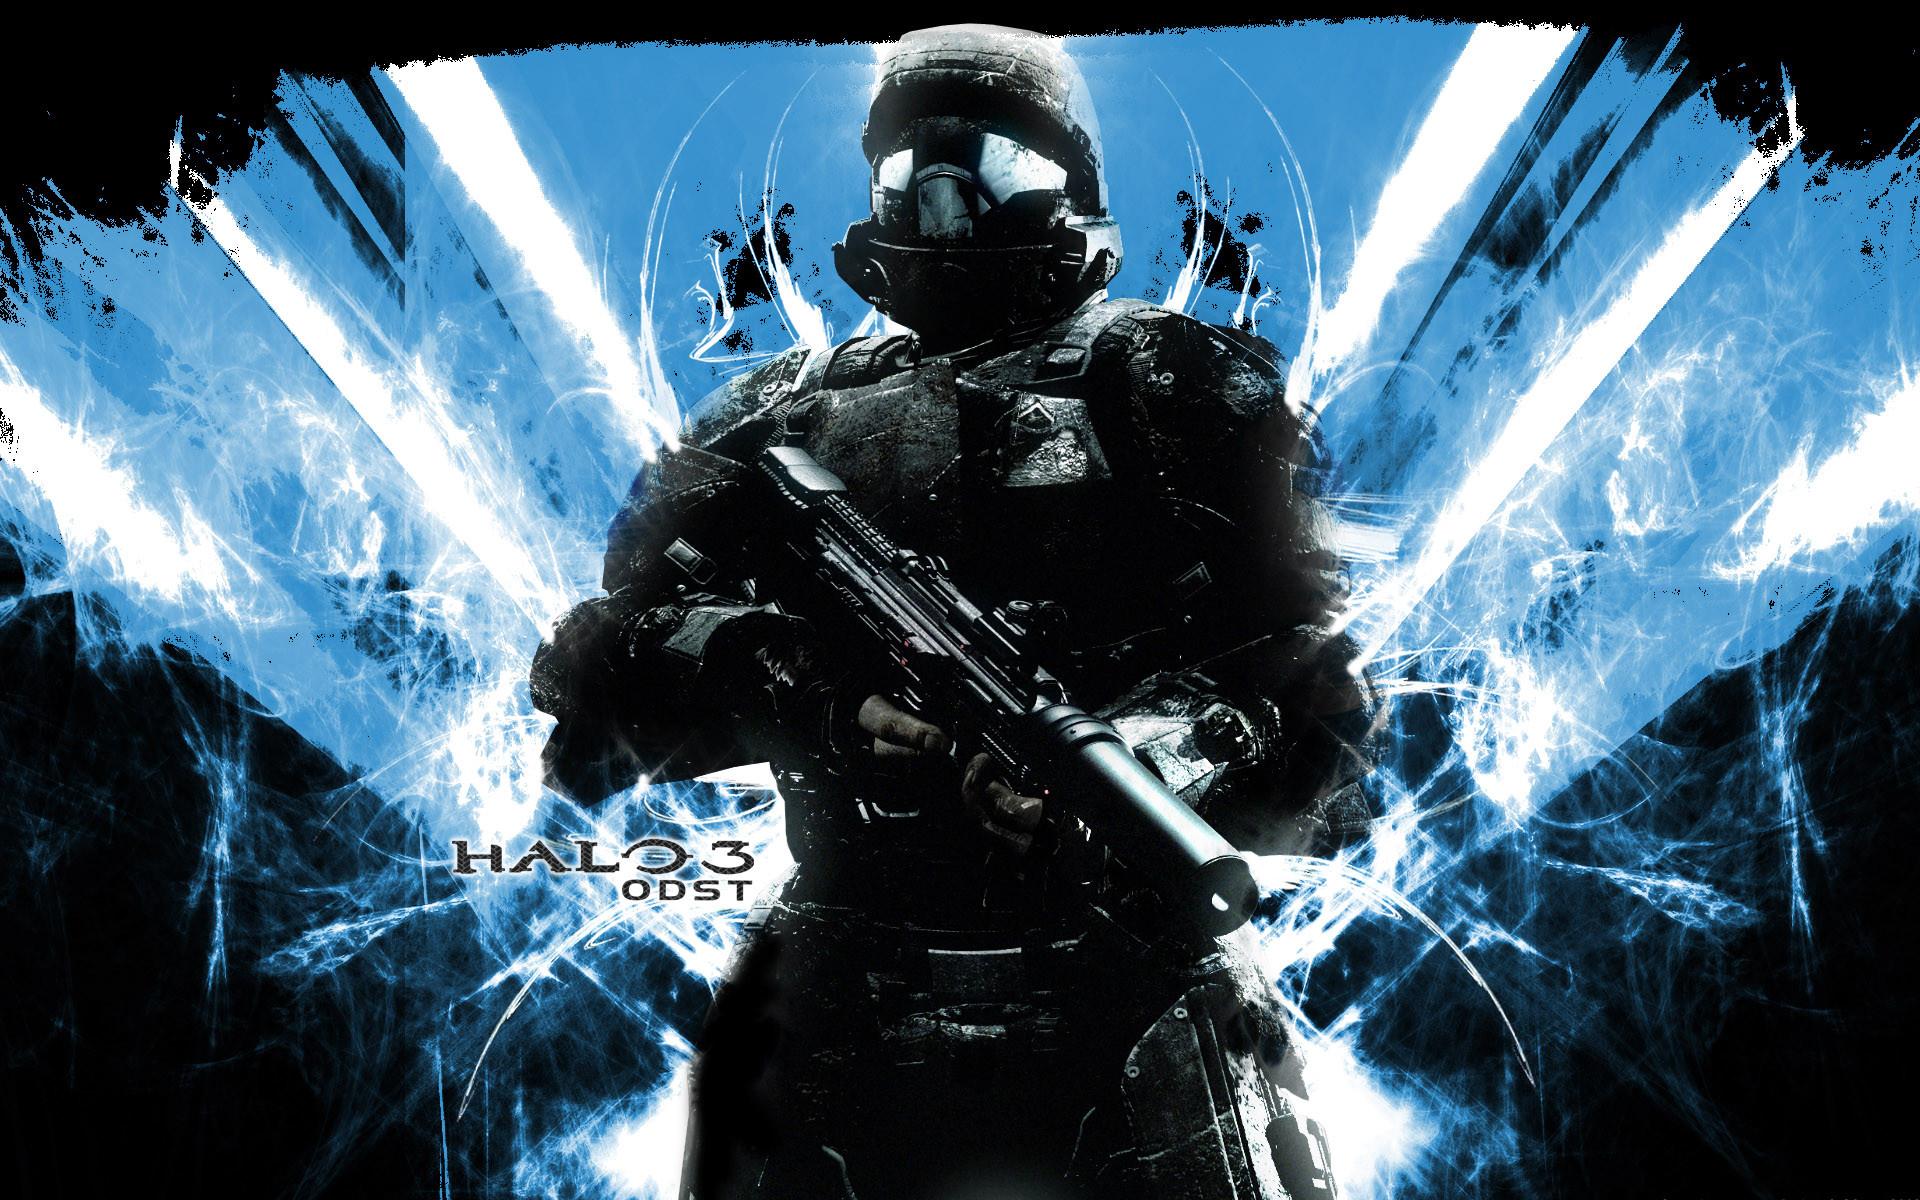 High Resolution Best Game Red vs Blue Wallpaper HD 4 Full Size …    Download Wallpaper   Pinterest   Red vs blue, Blue wallpapers and 3d  wallpaper